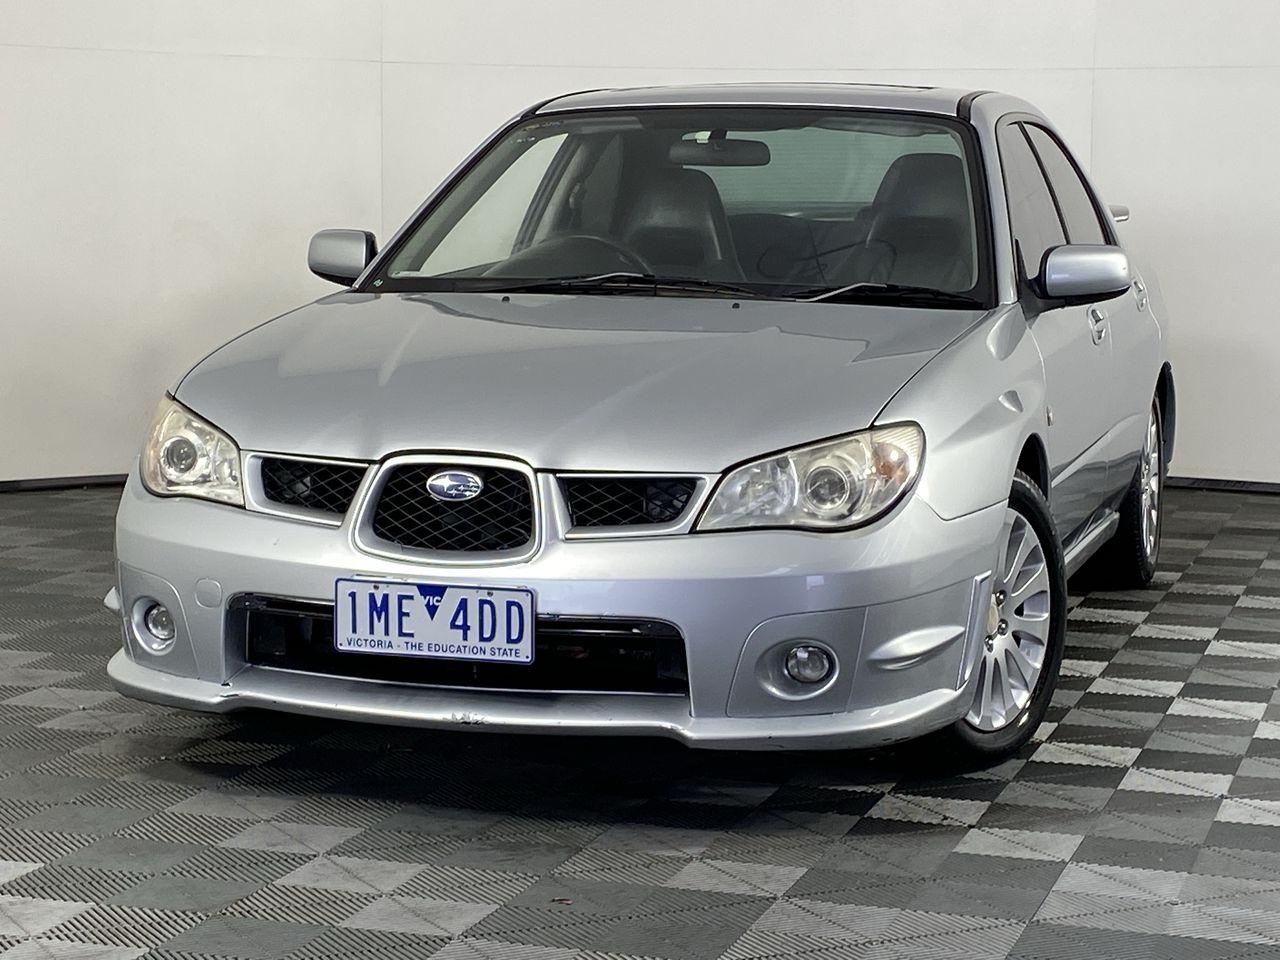 2007 Subaru Impreza 2.0i (AWD) G2 Automatic Sedan (WOVR Inspected)